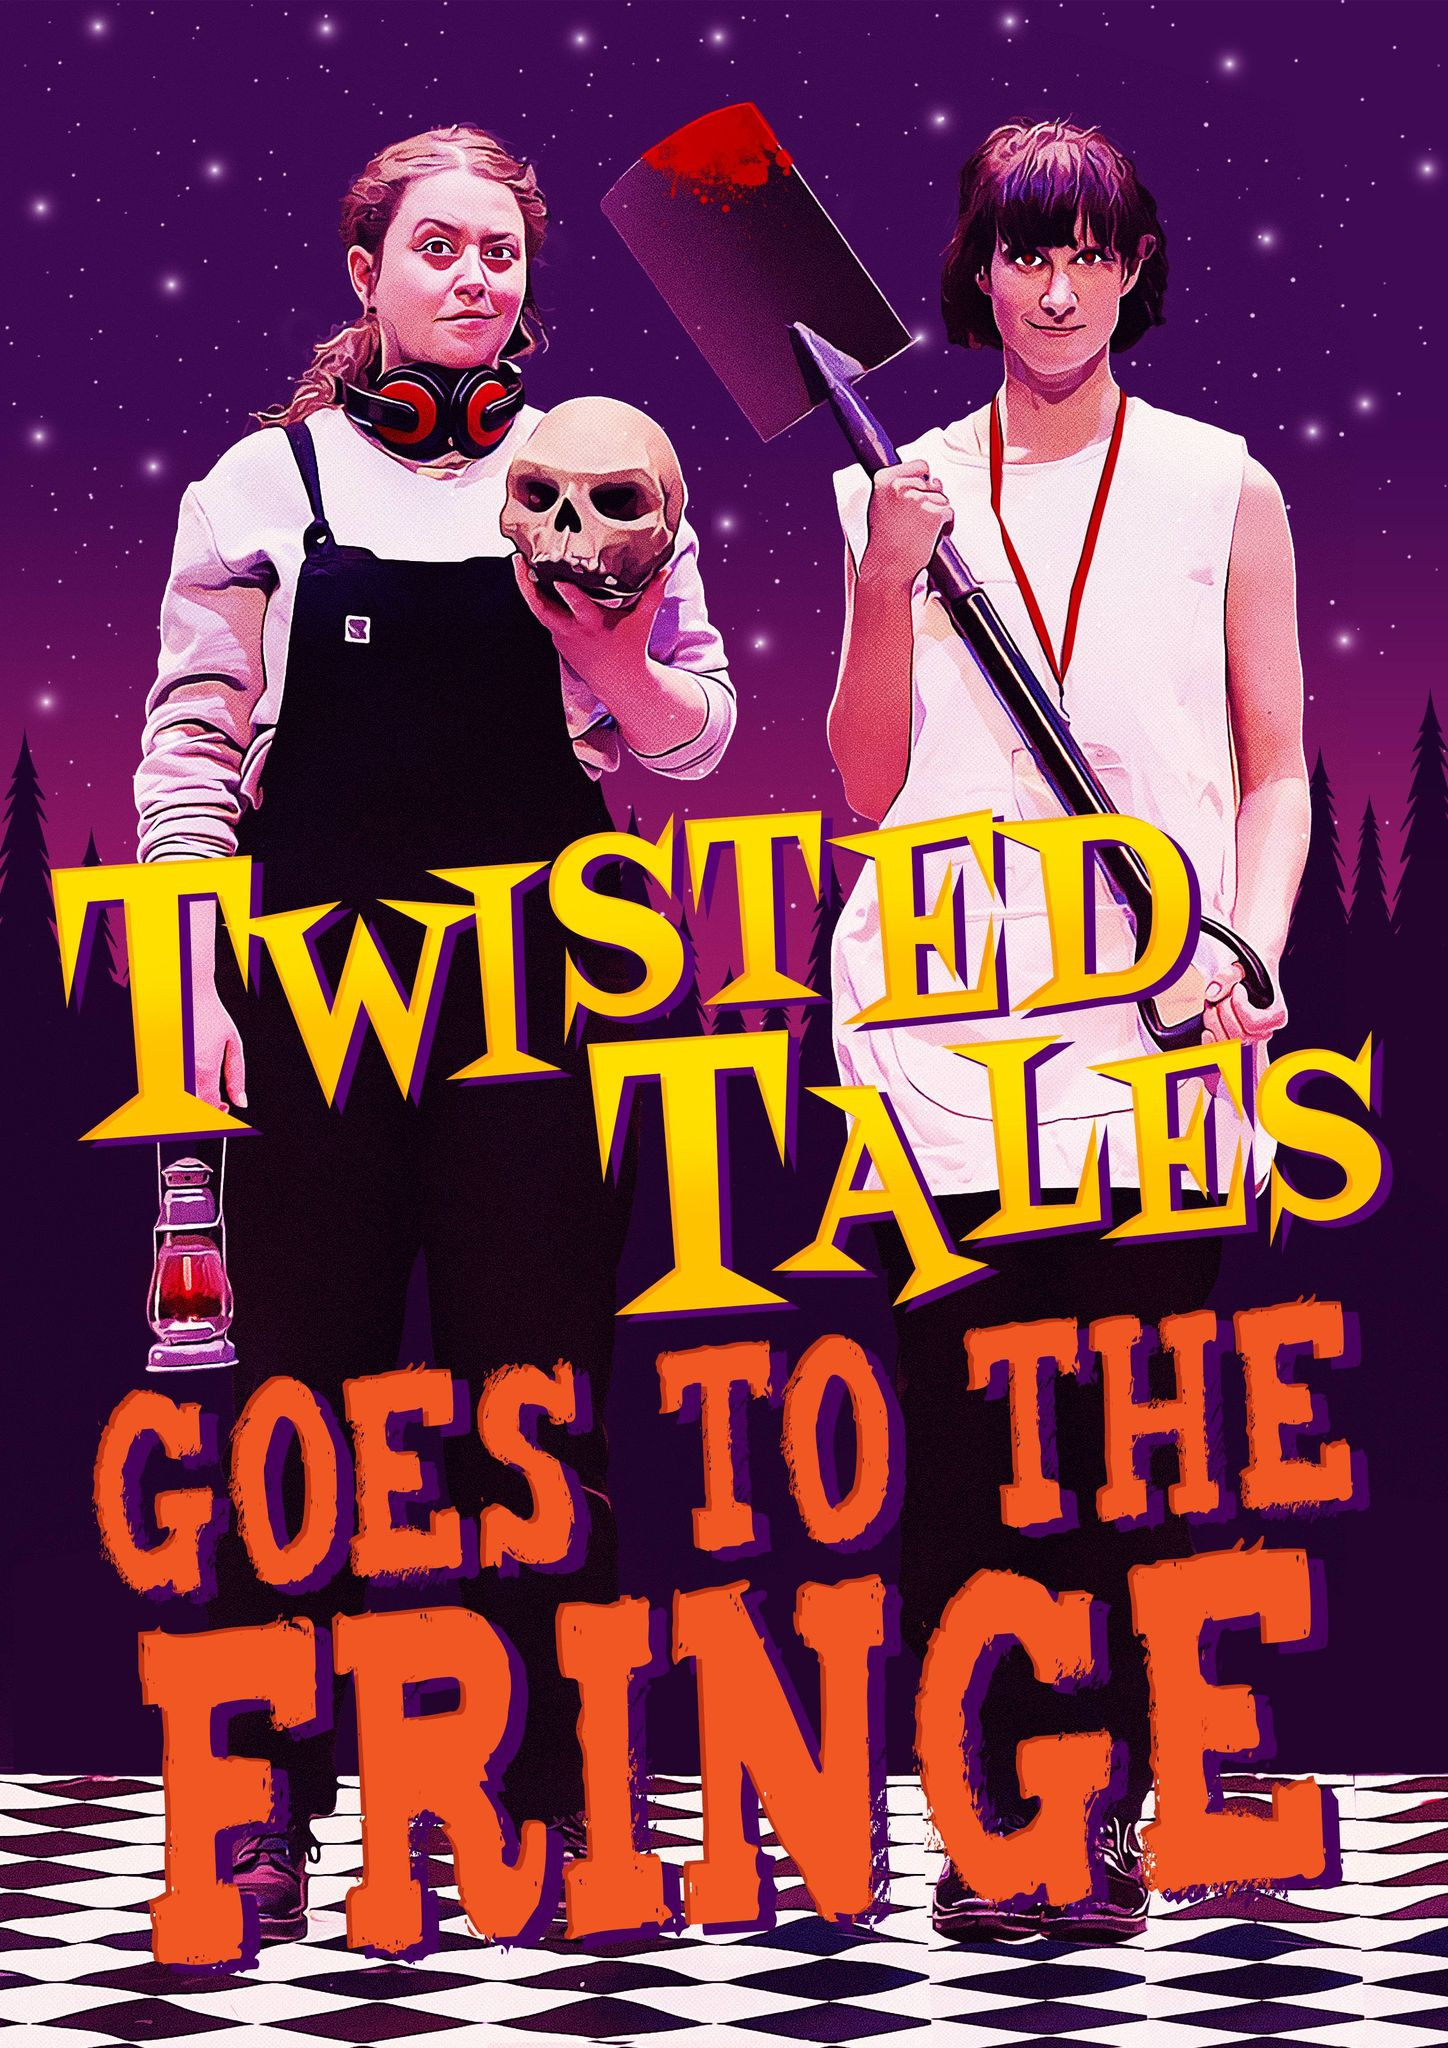 'Twisted Tales Goes to the Fringe' Edinburgh Livestream